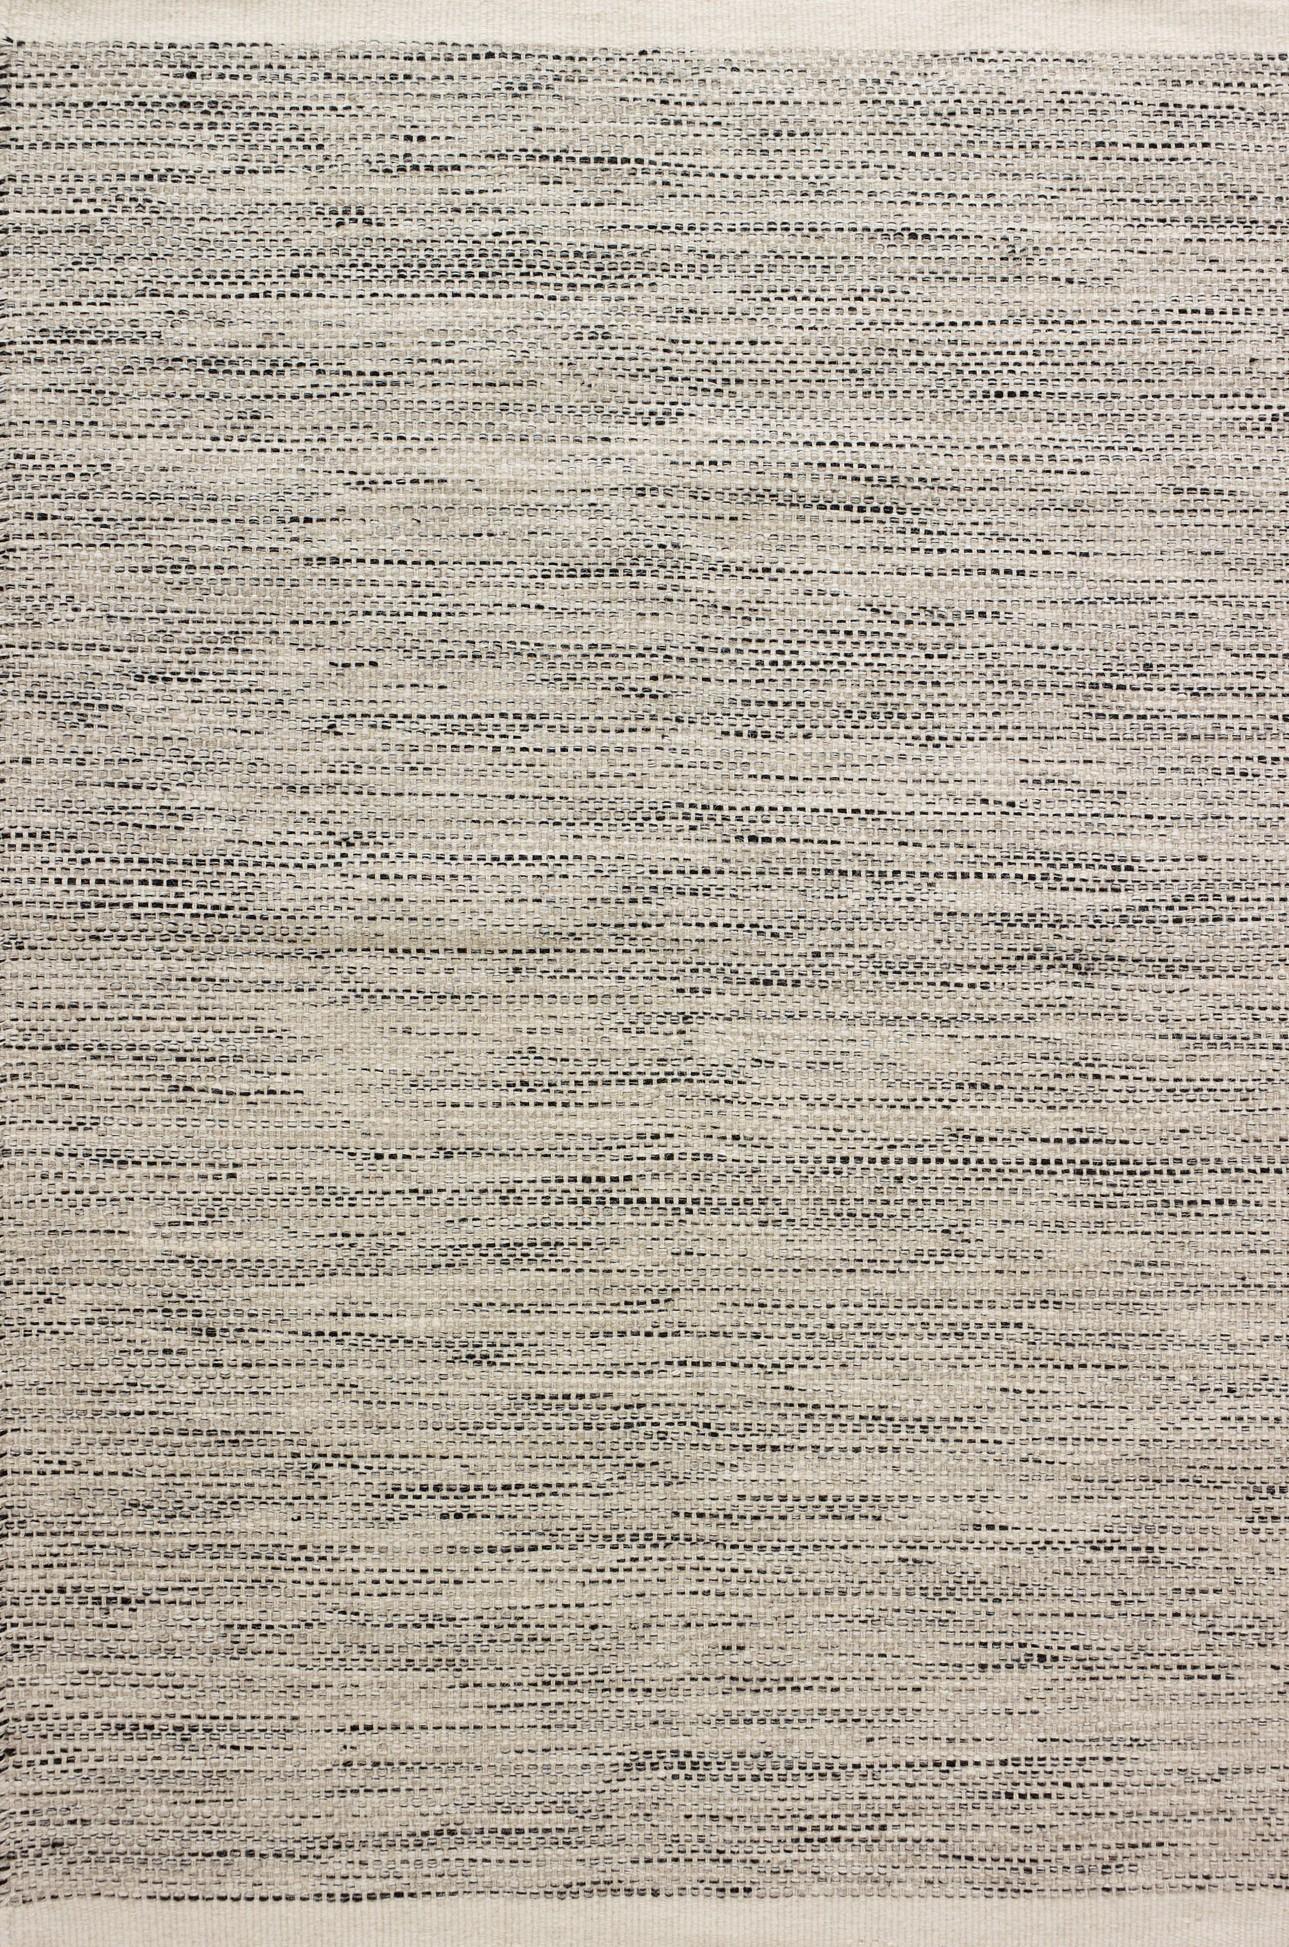 Rep Hand-Woven Flatweave Rug (Colour: Black, Rug Size: 160 x 230)